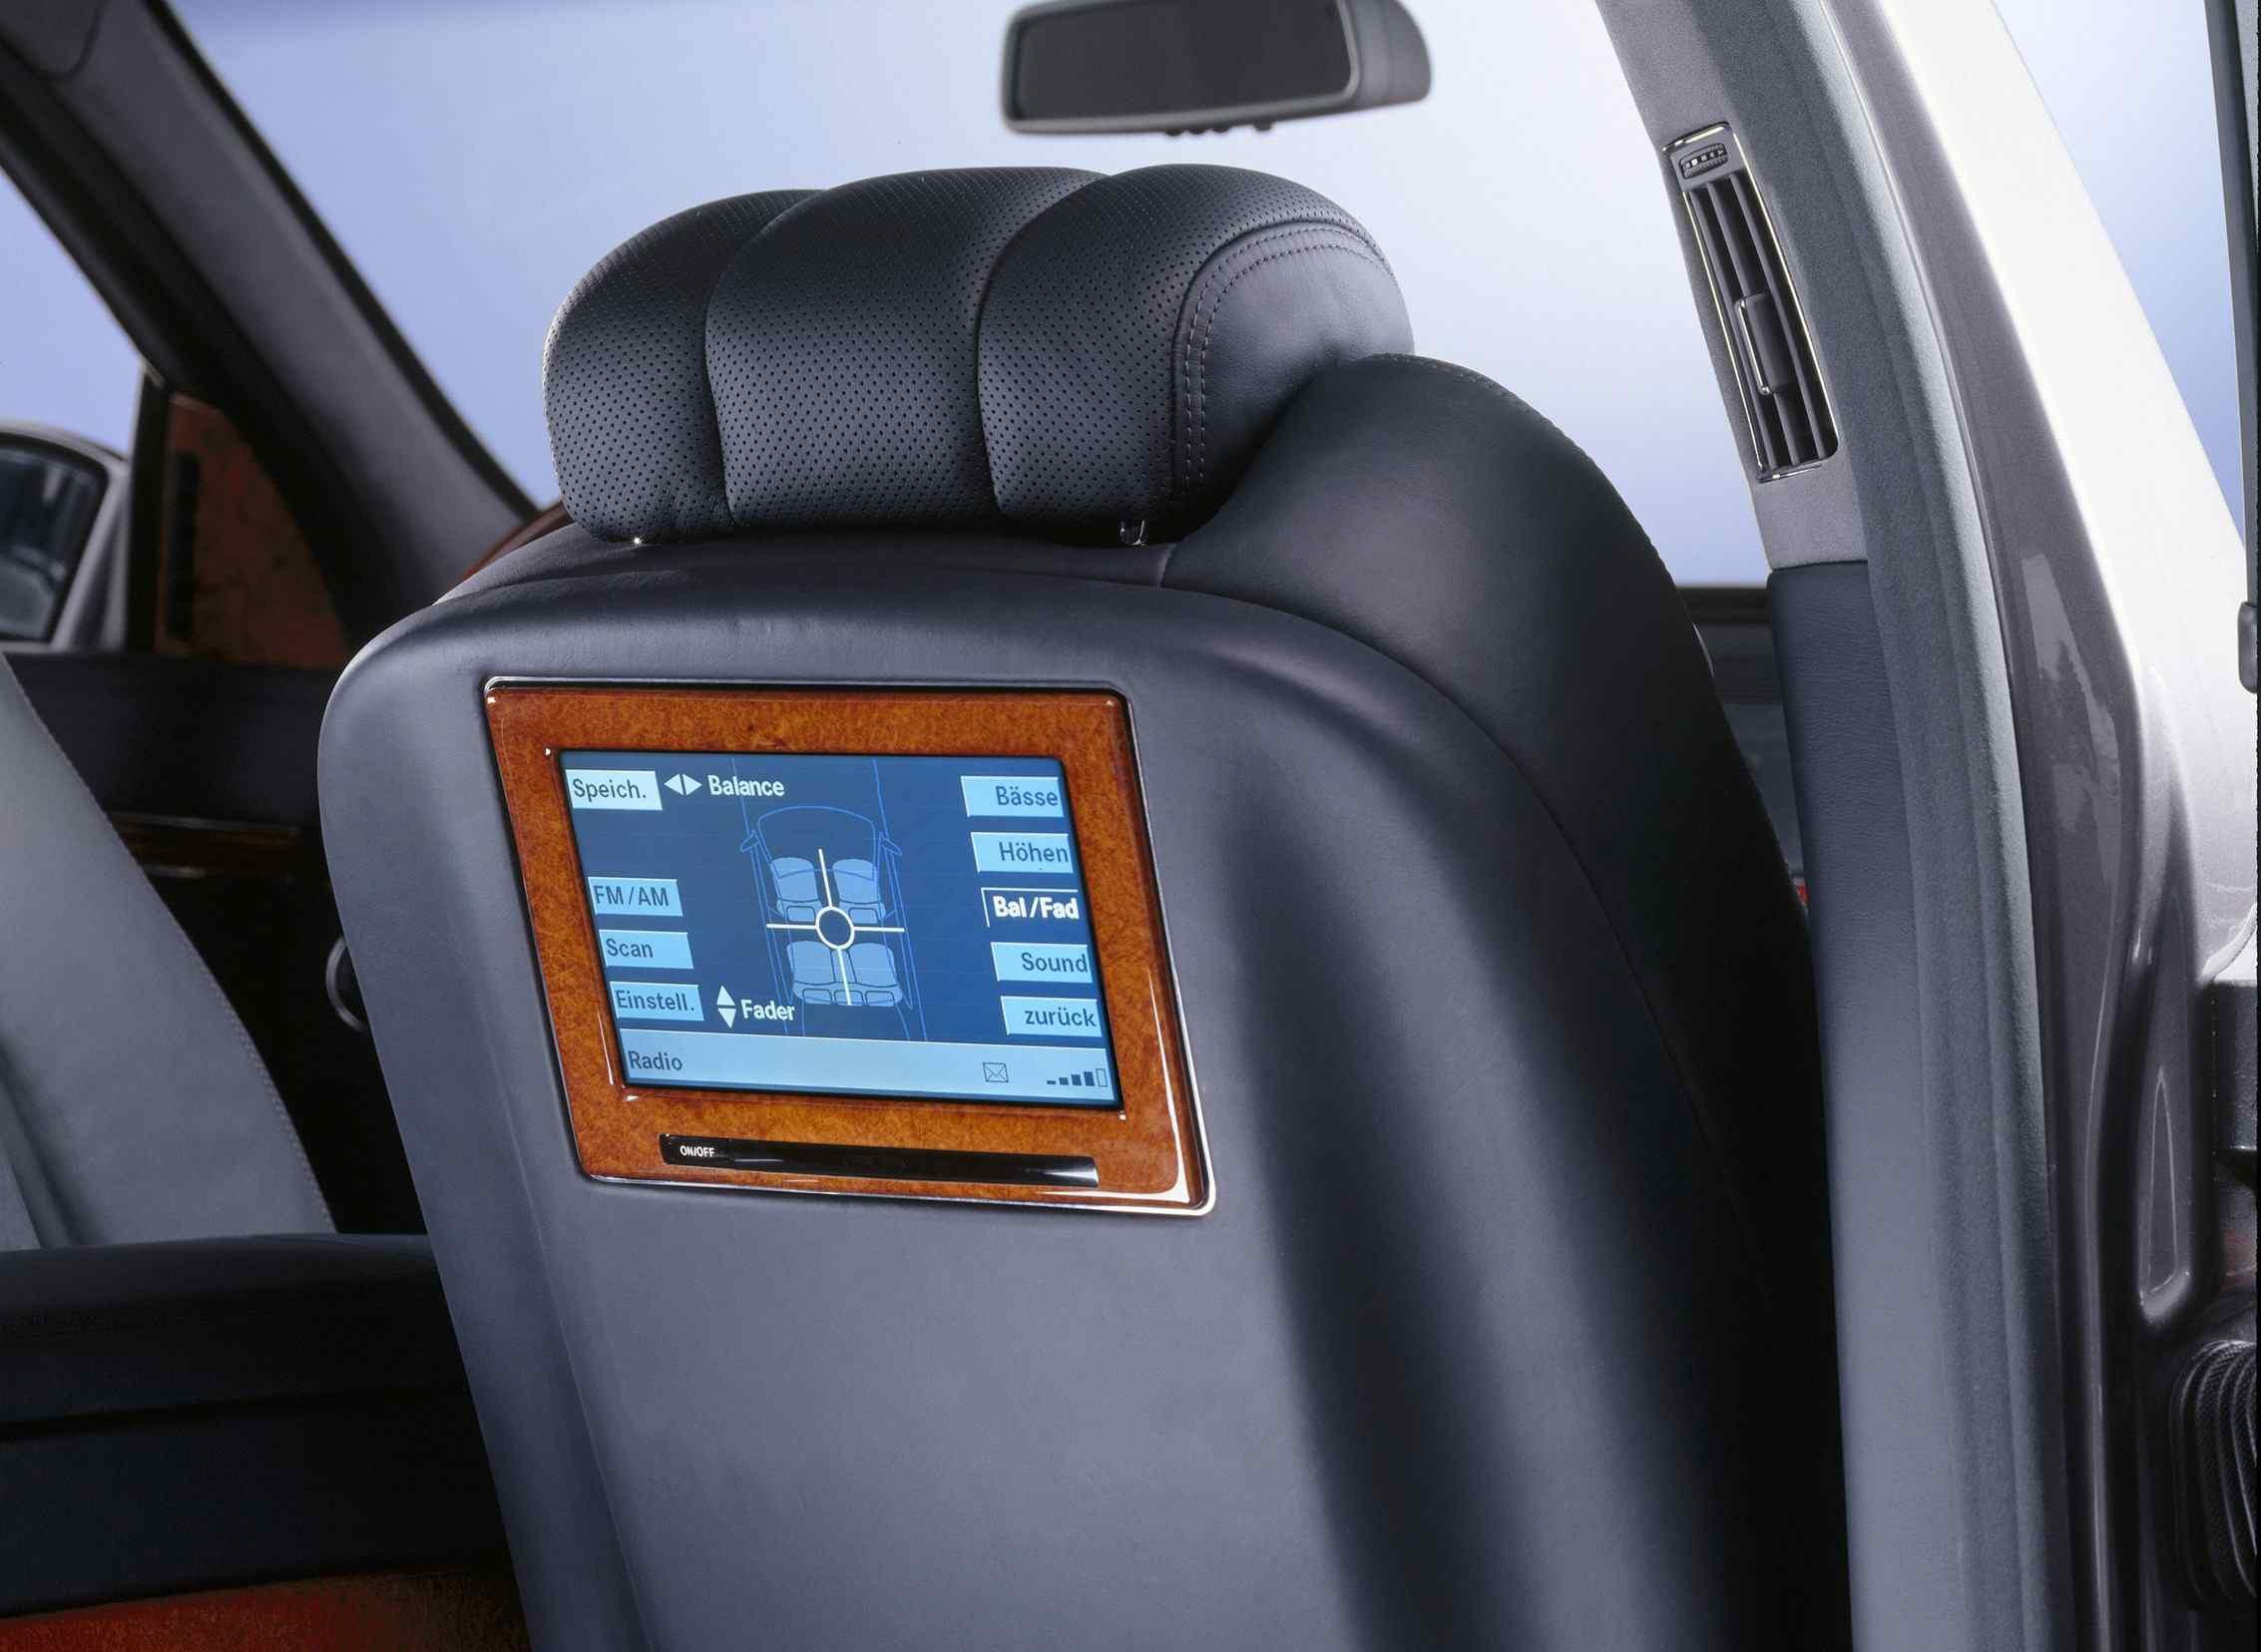 Car seat screen